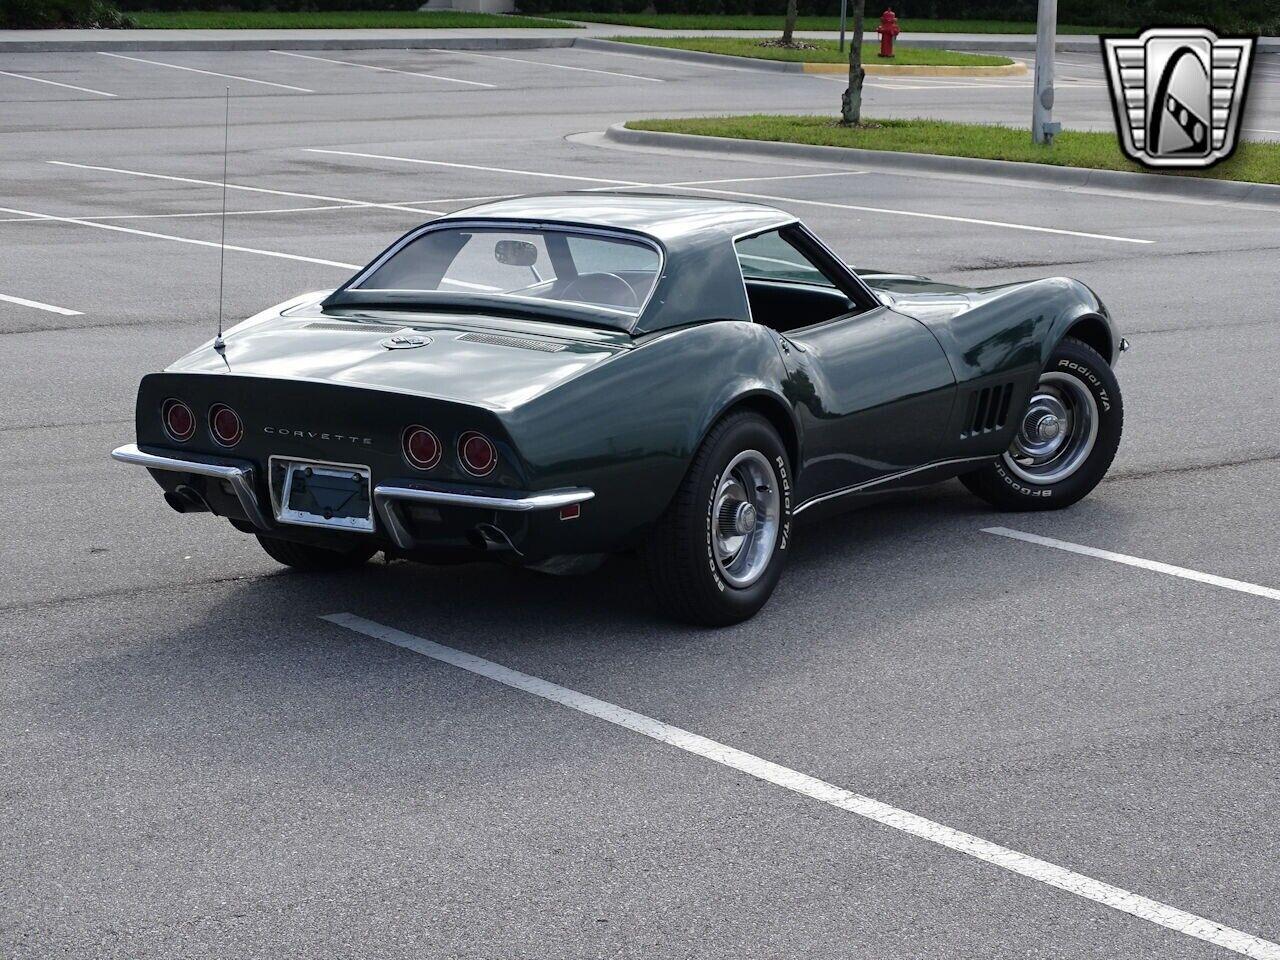 1968 Green Chevrolet Corvette   | C3 Corvette Photo 3